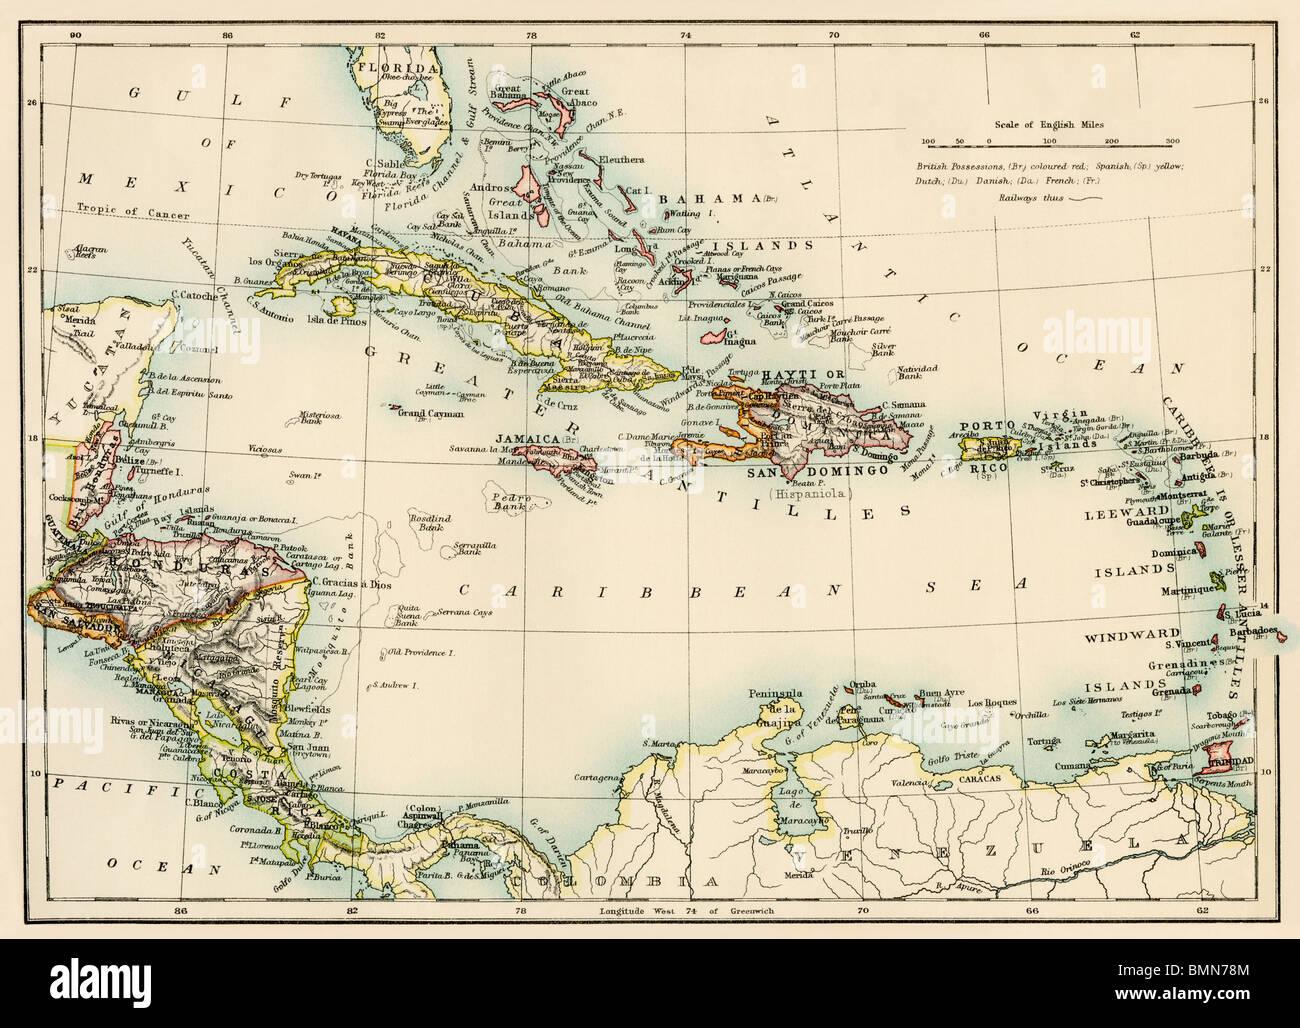 Puerto Rico Island Map Printable